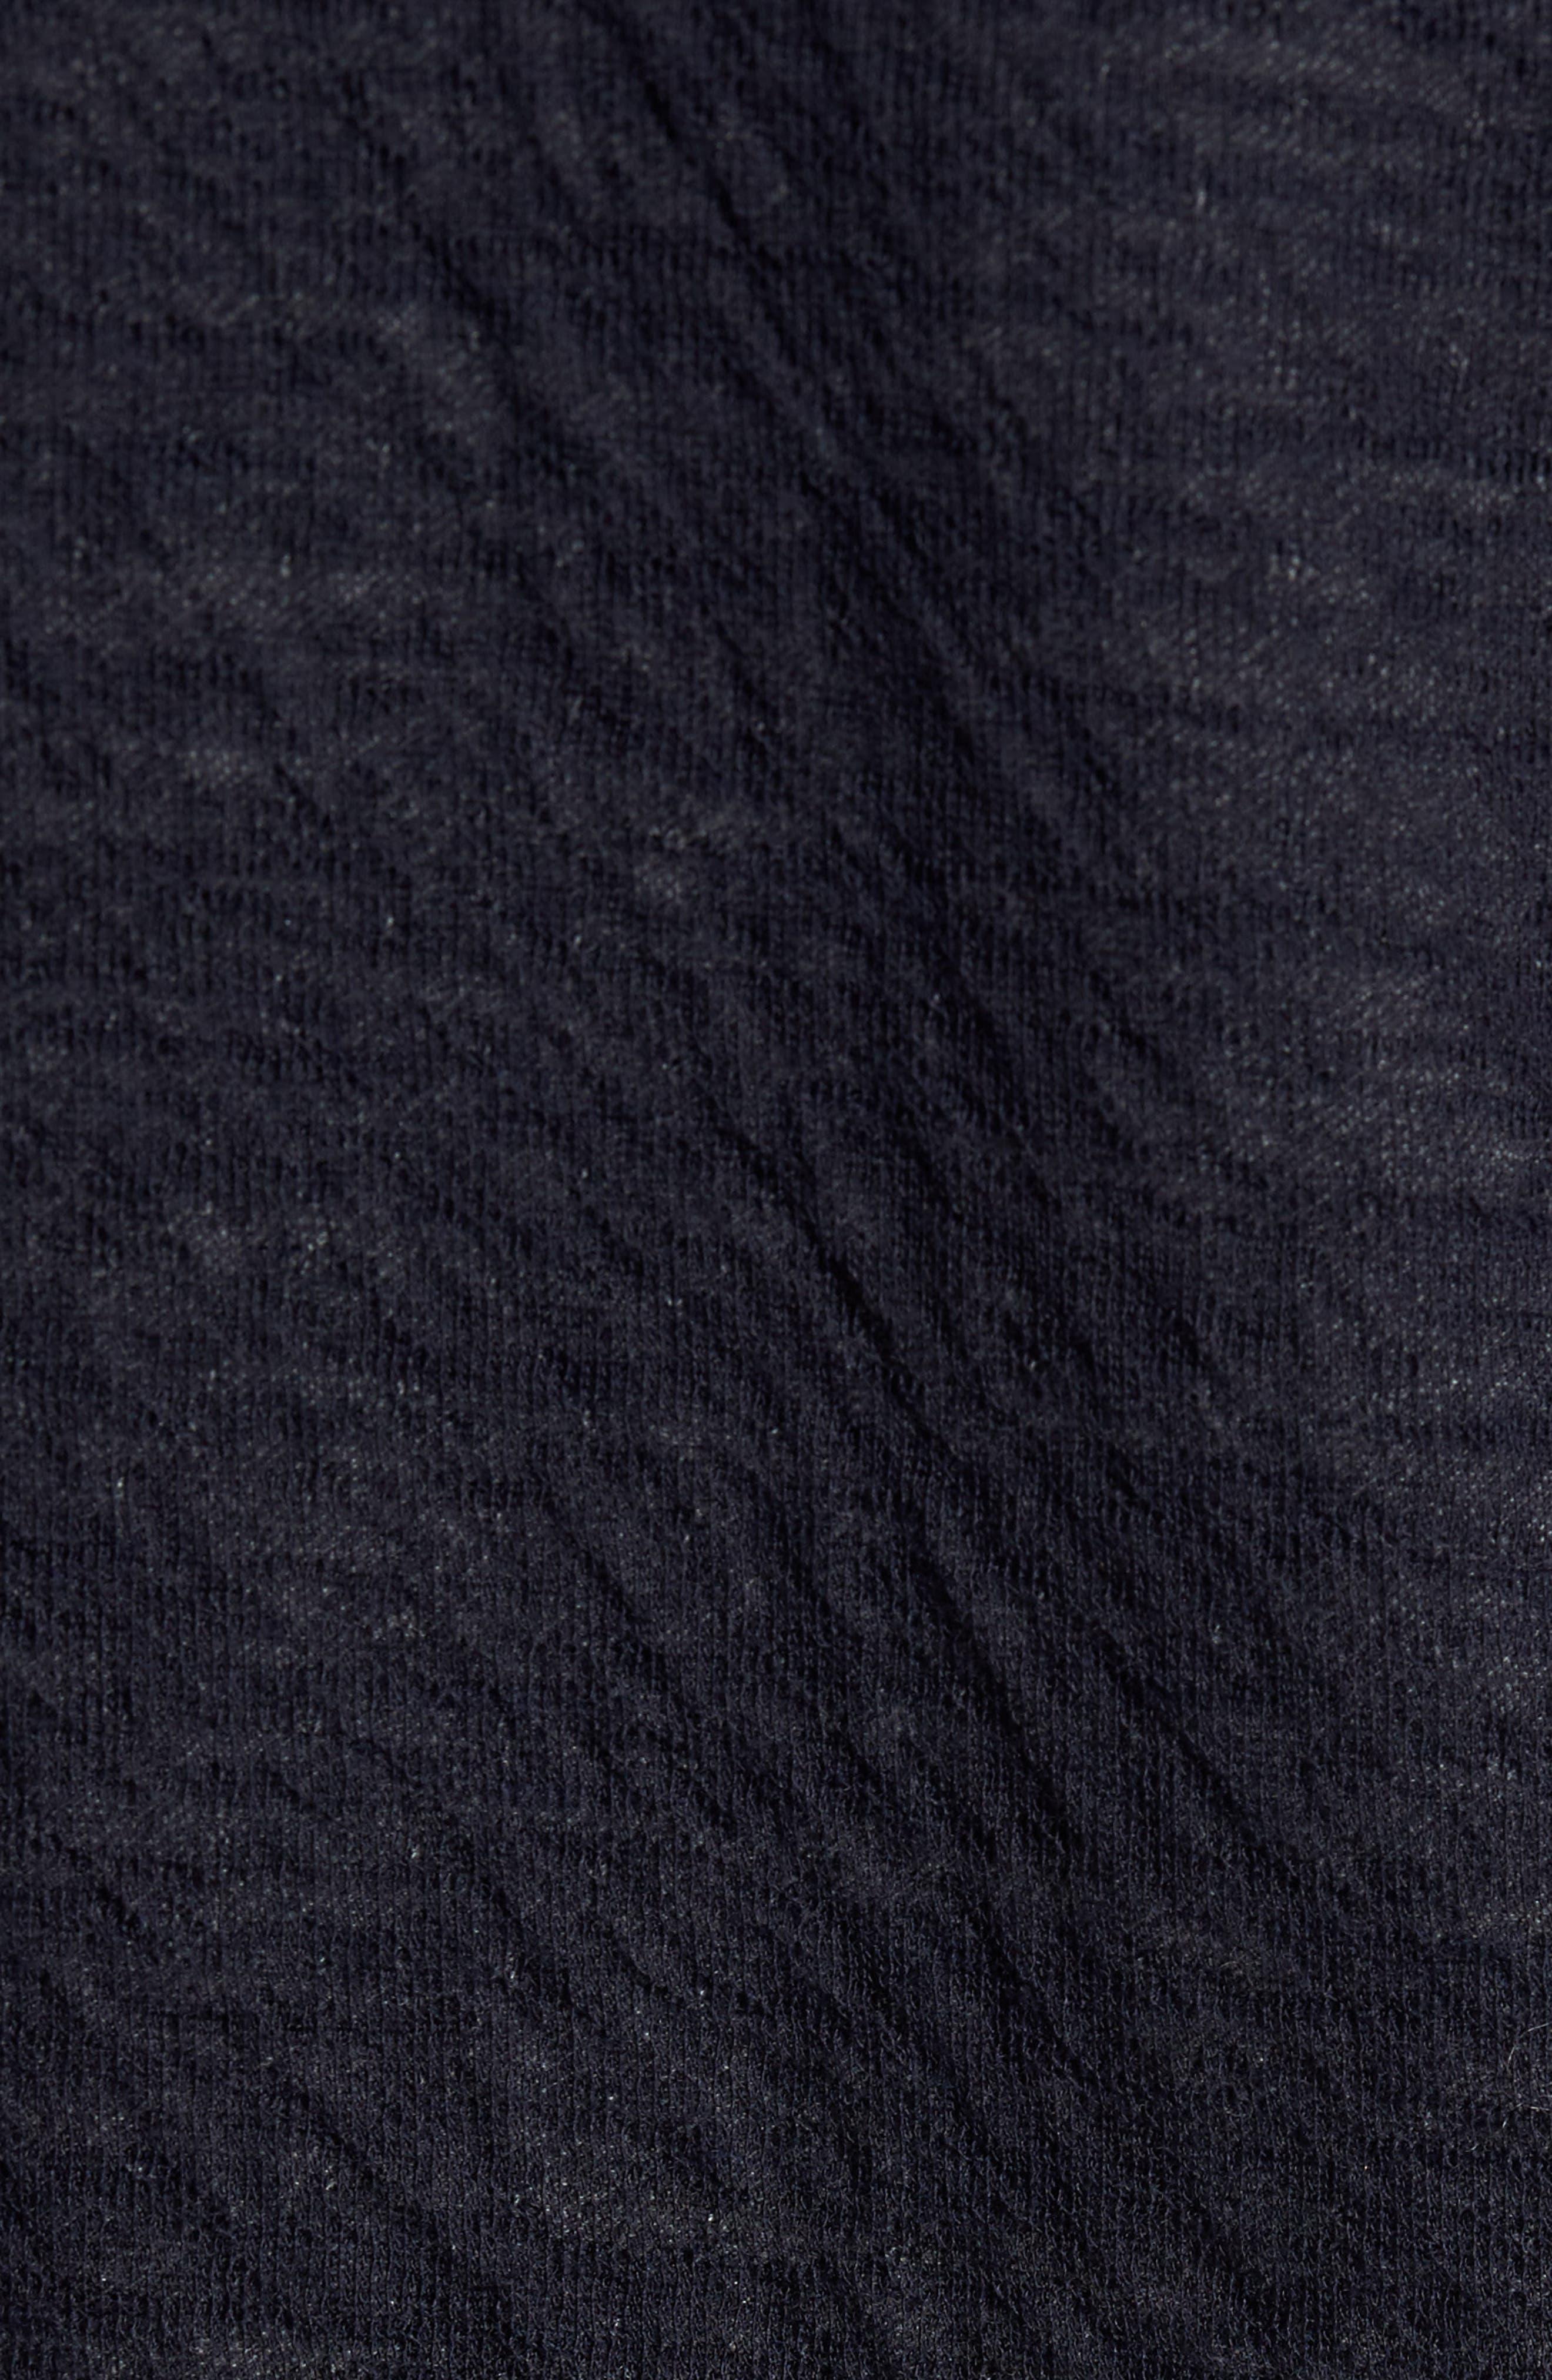 Double Knit Long Sleeve Shirt,                             Alternate thumbnail 10, color,